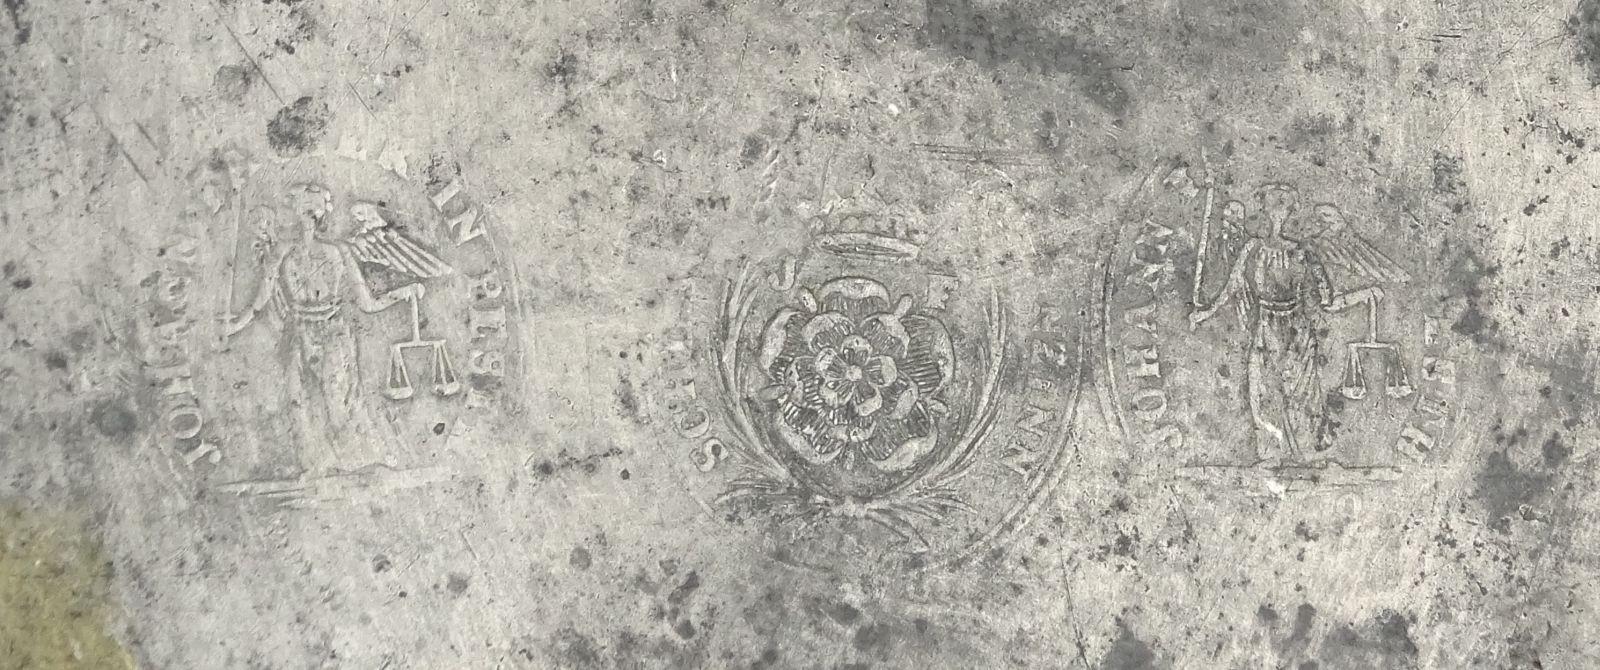 DSC03655.JPG (1600×670)